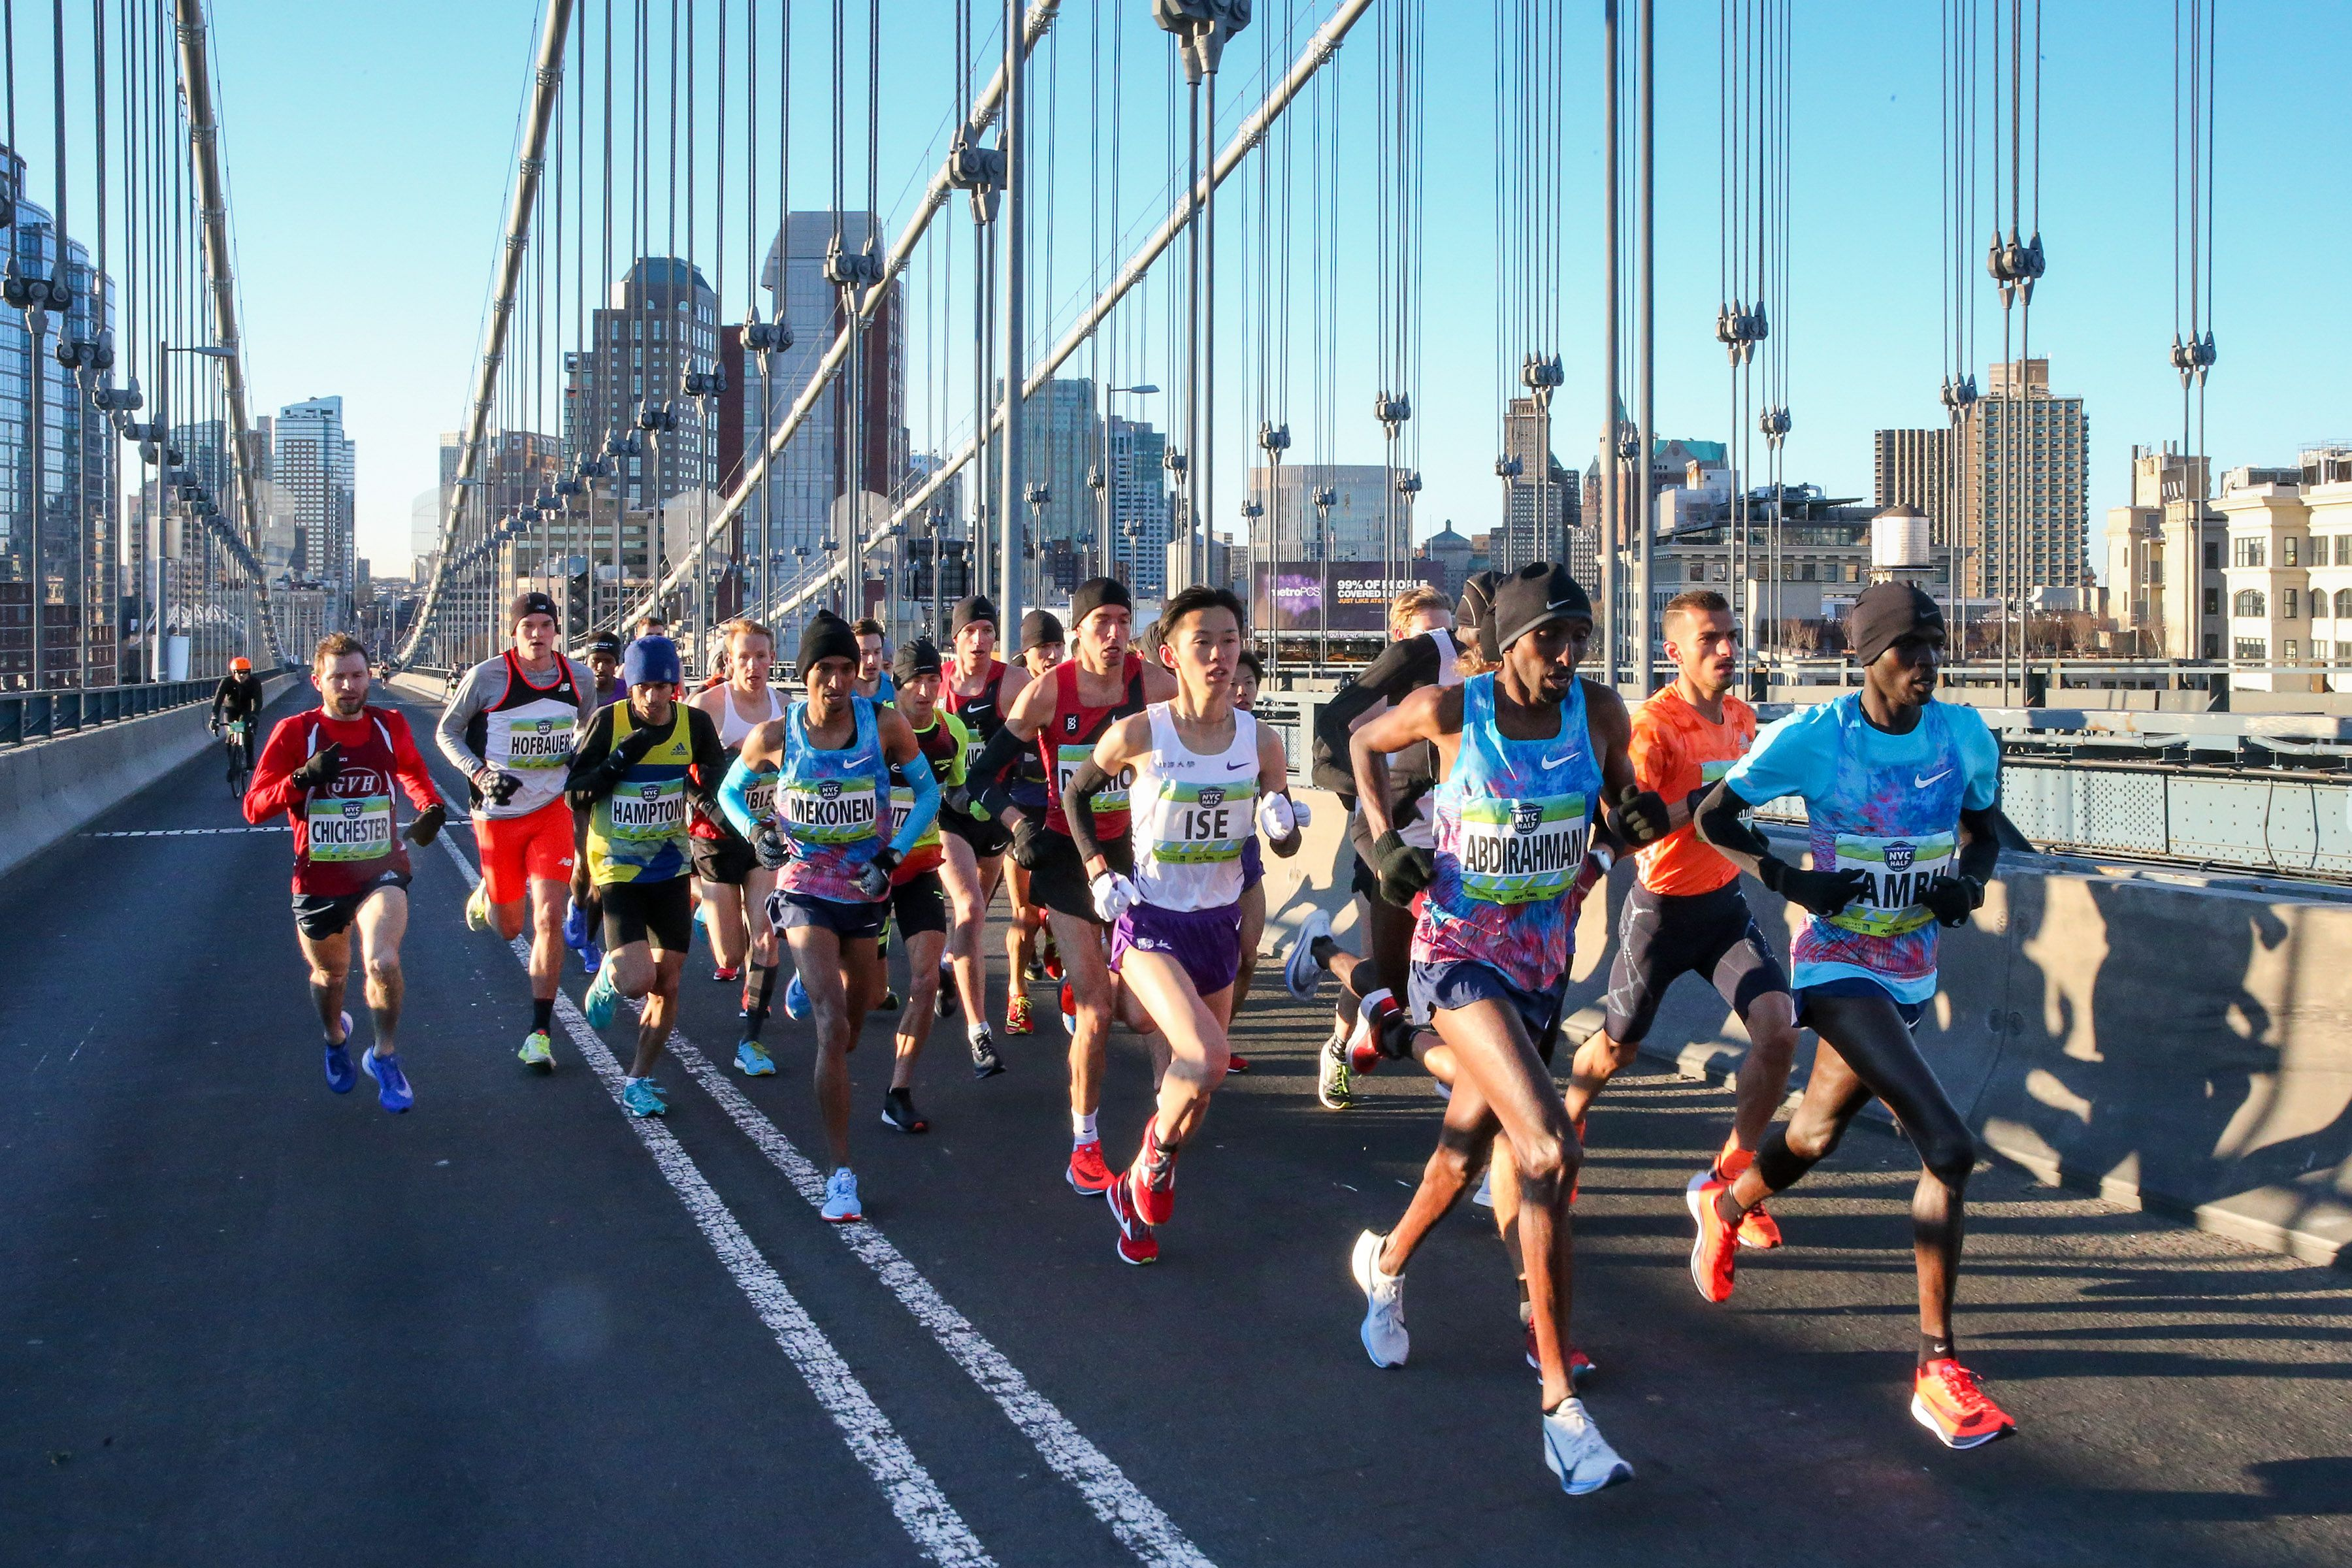 Map Of New York Half Marathon.How To Watch The Nyc Half Marathon Nyc Half Marathon 2019